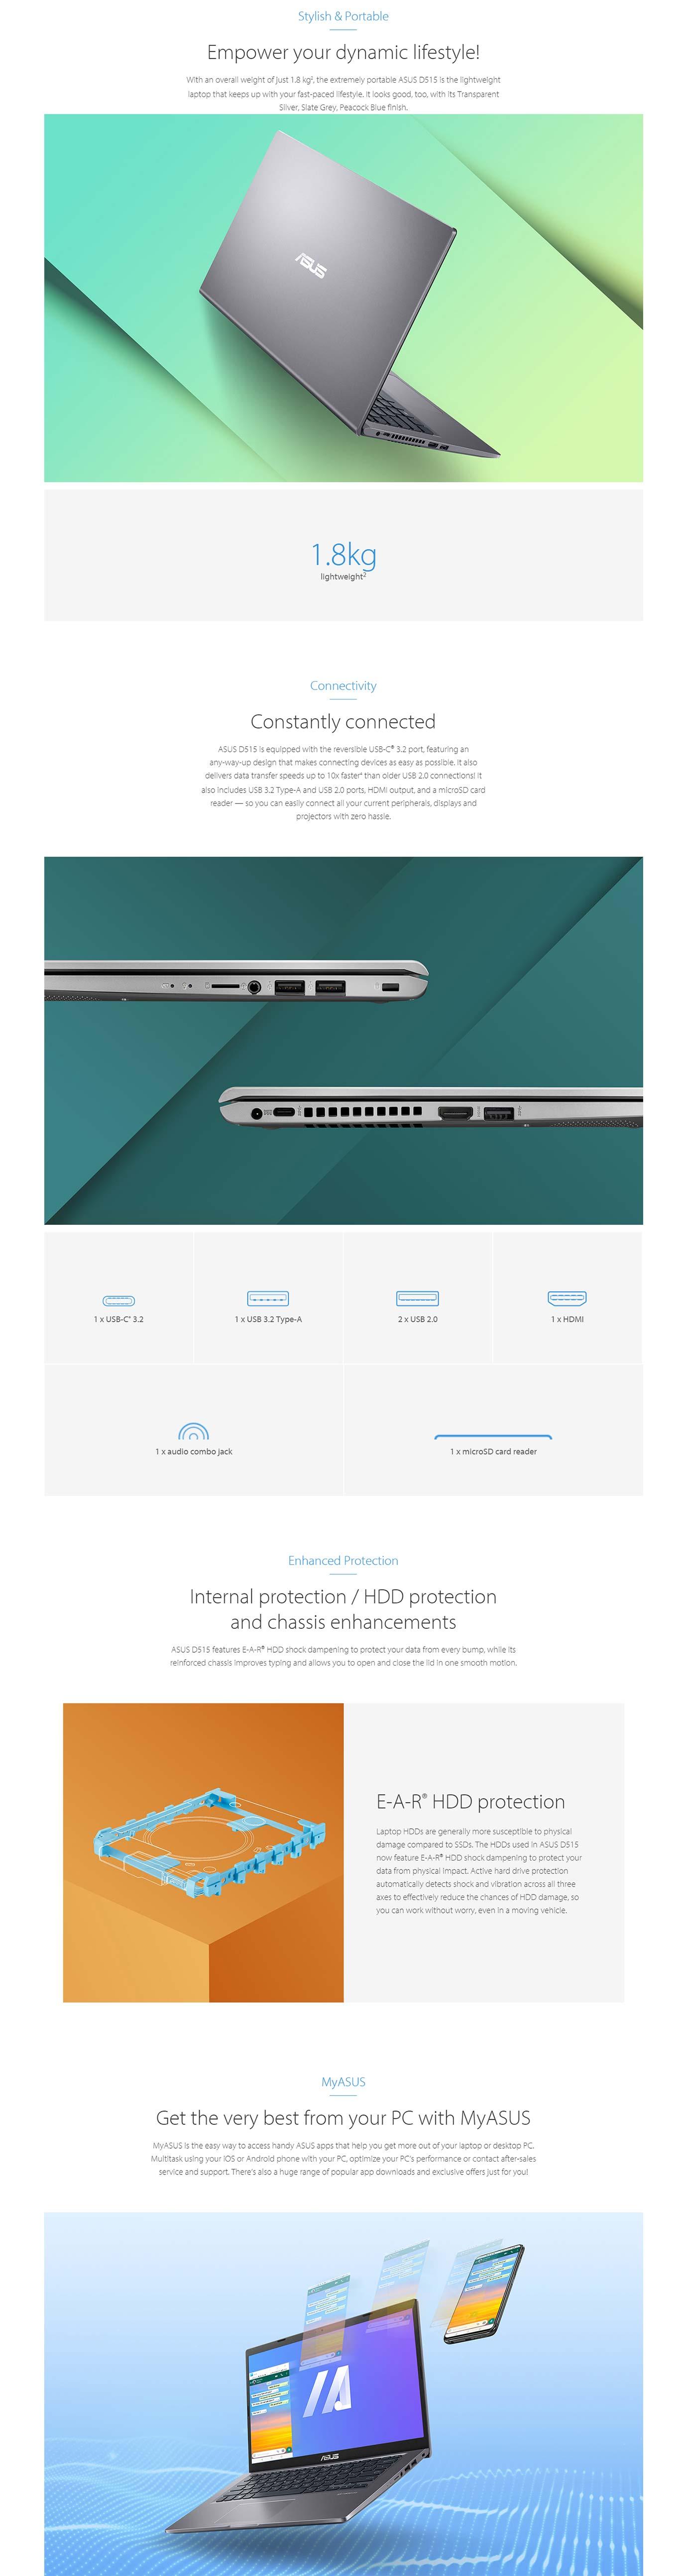 Asus D515DA Laptop